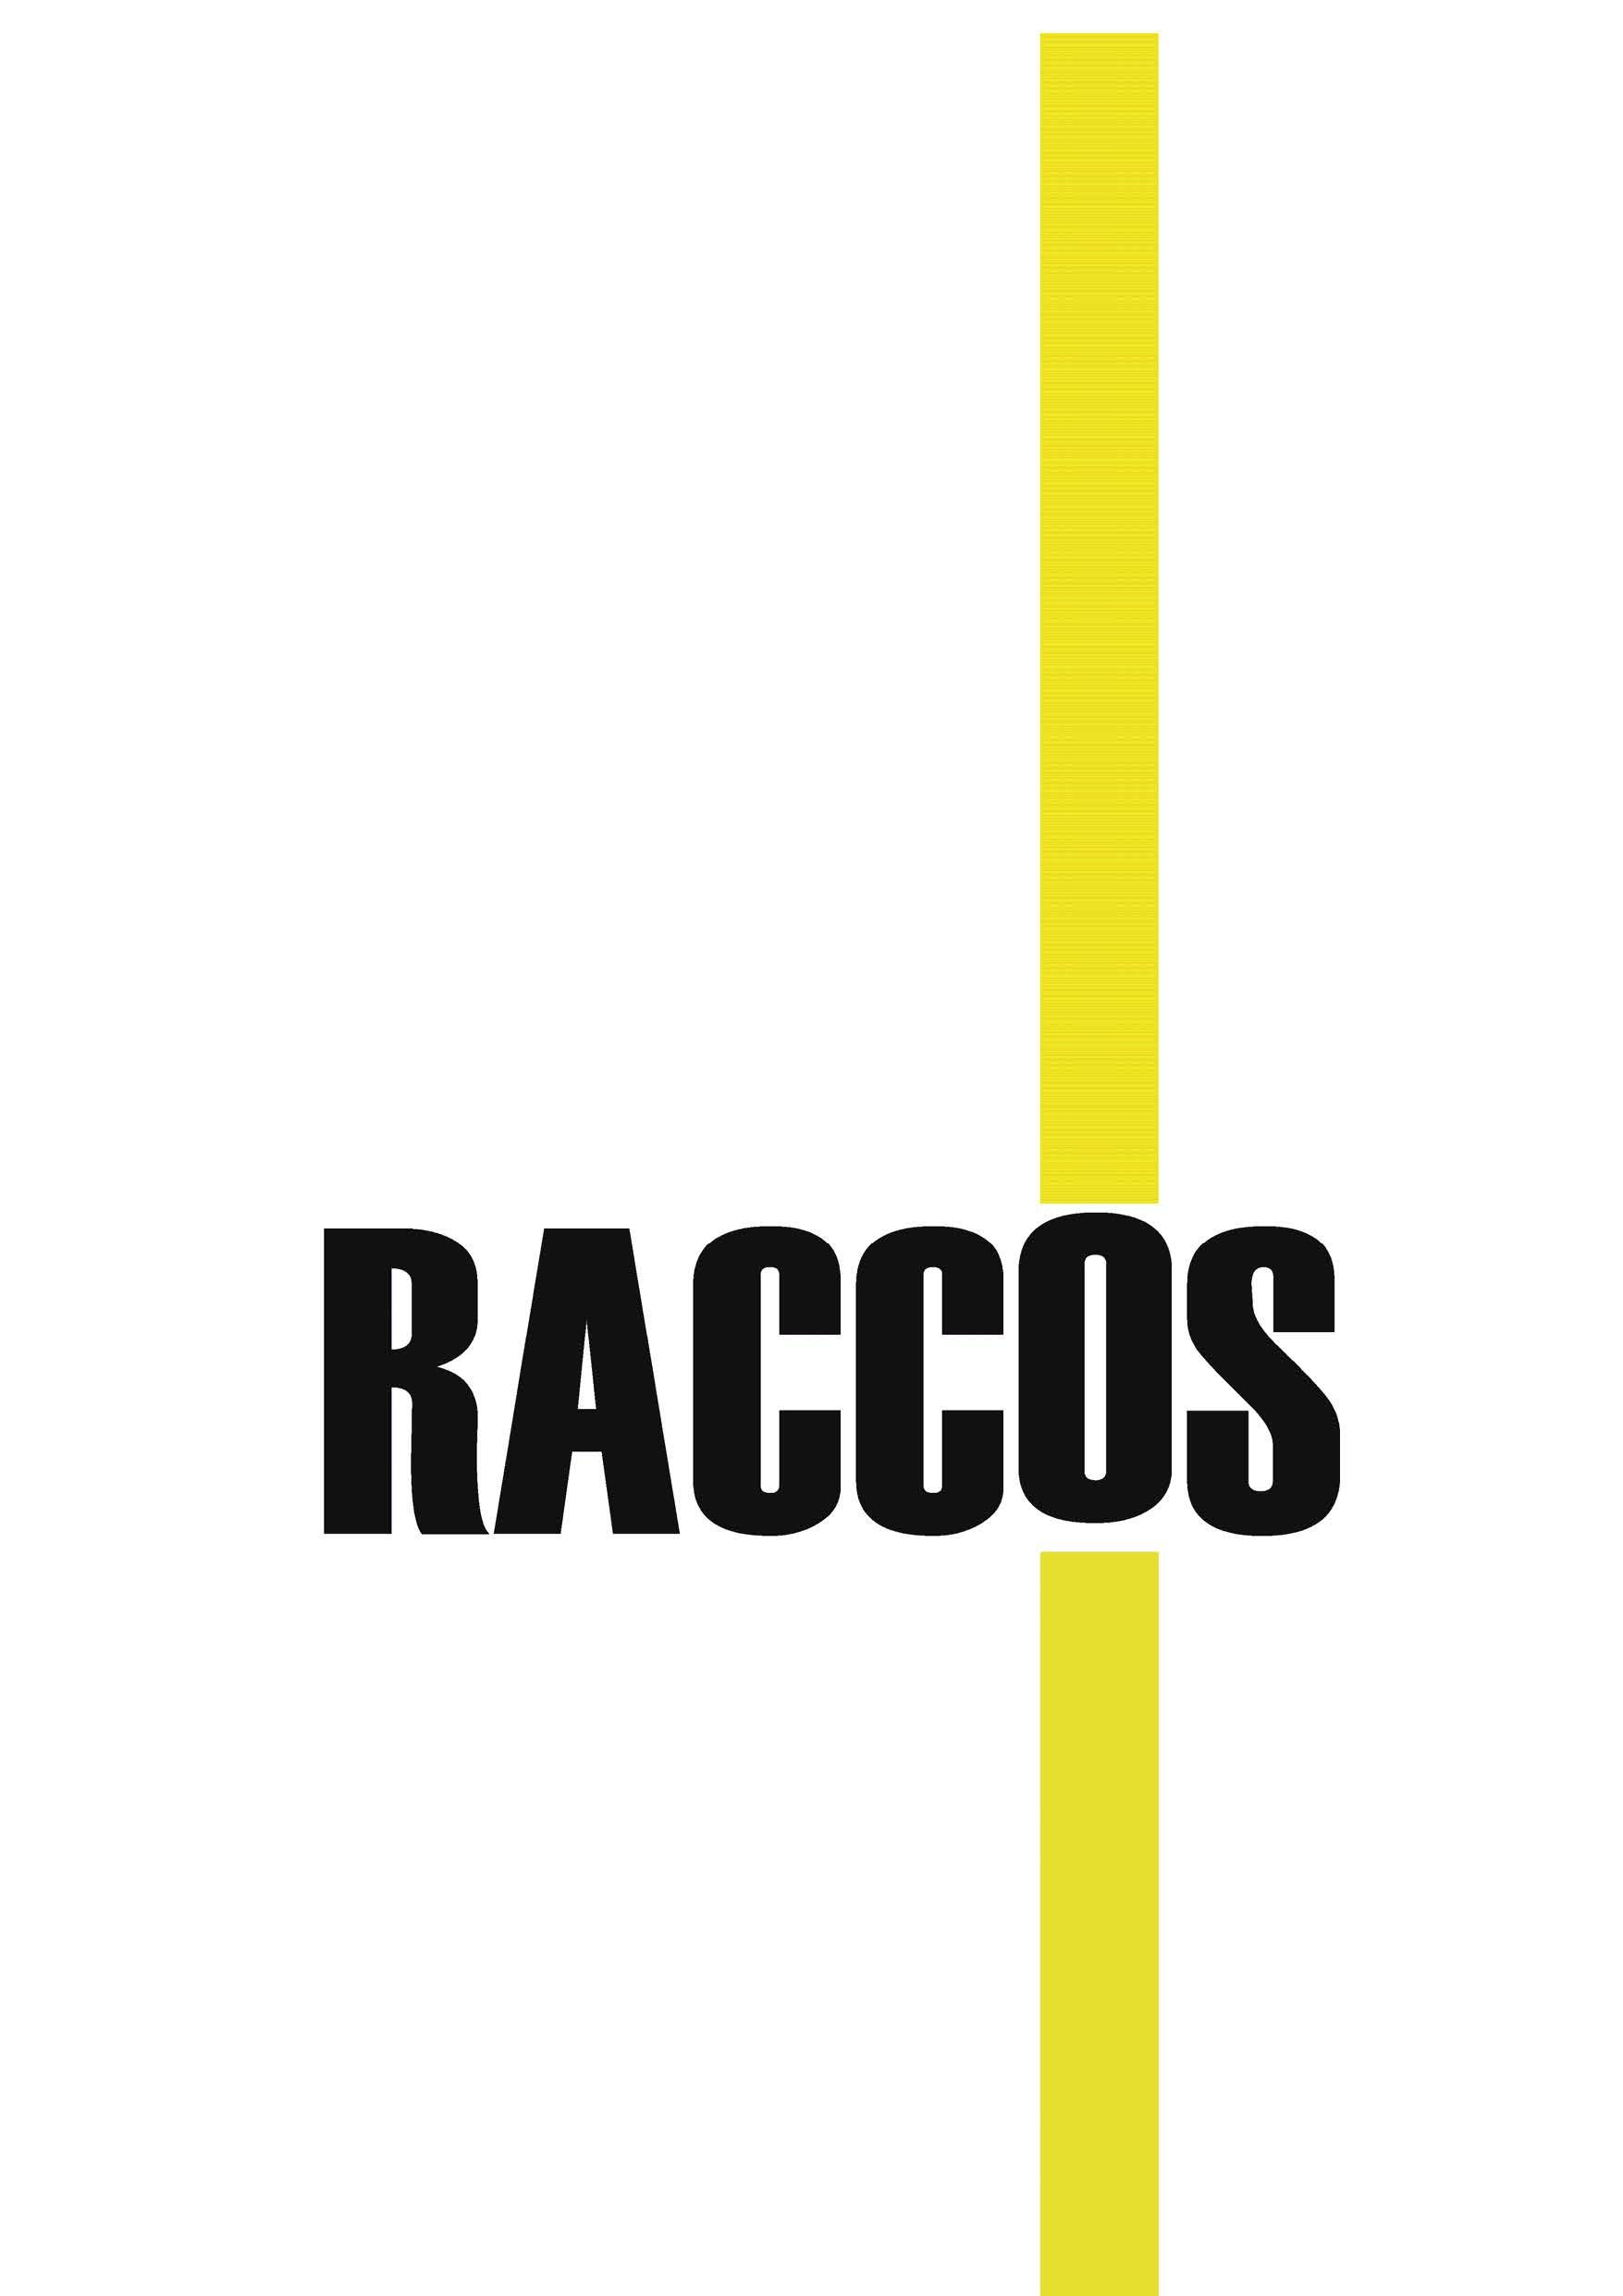 Raccos